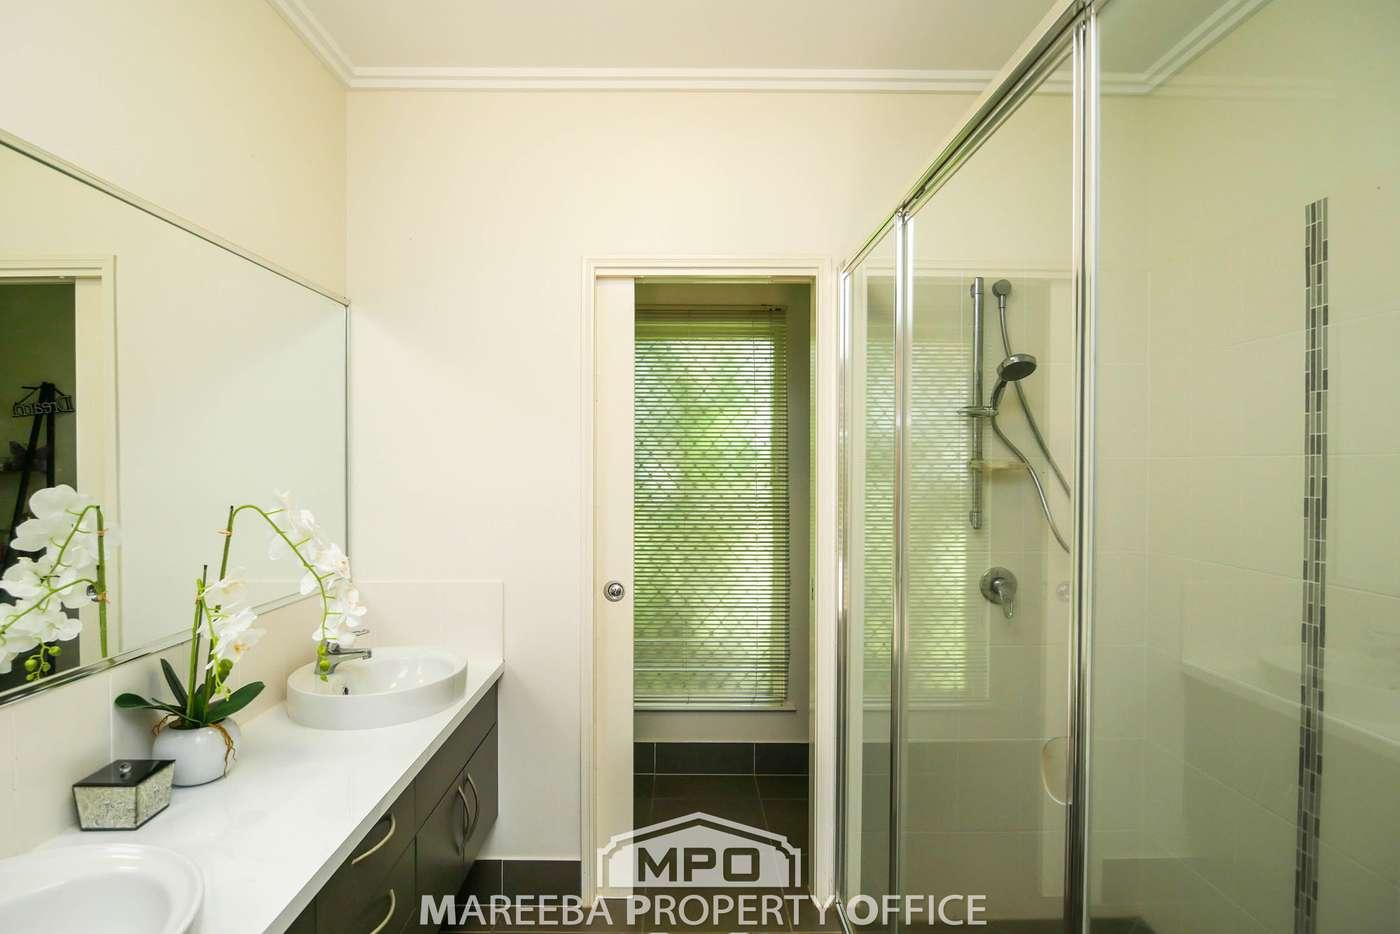 Sixth view of Homely house listing, 1 Teresa Close, Mareeba QLD 4880